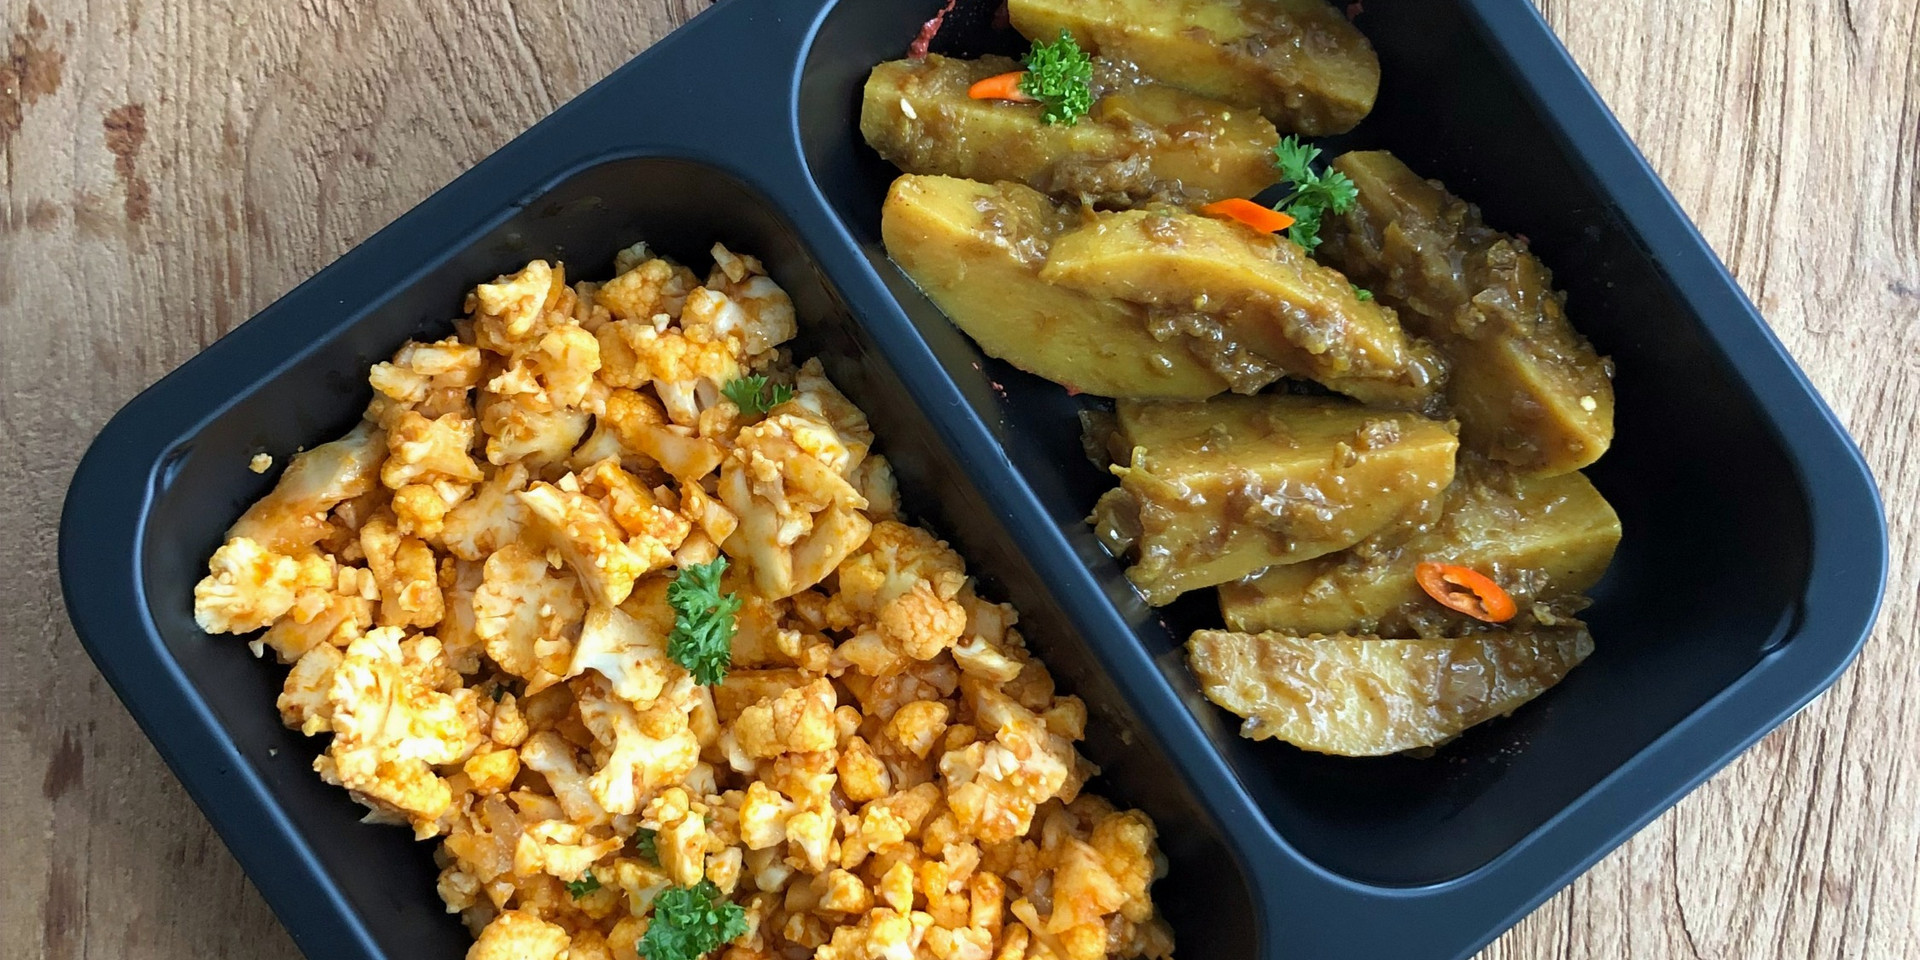 Bloemkoolrijst met gekruidde aardappelpa